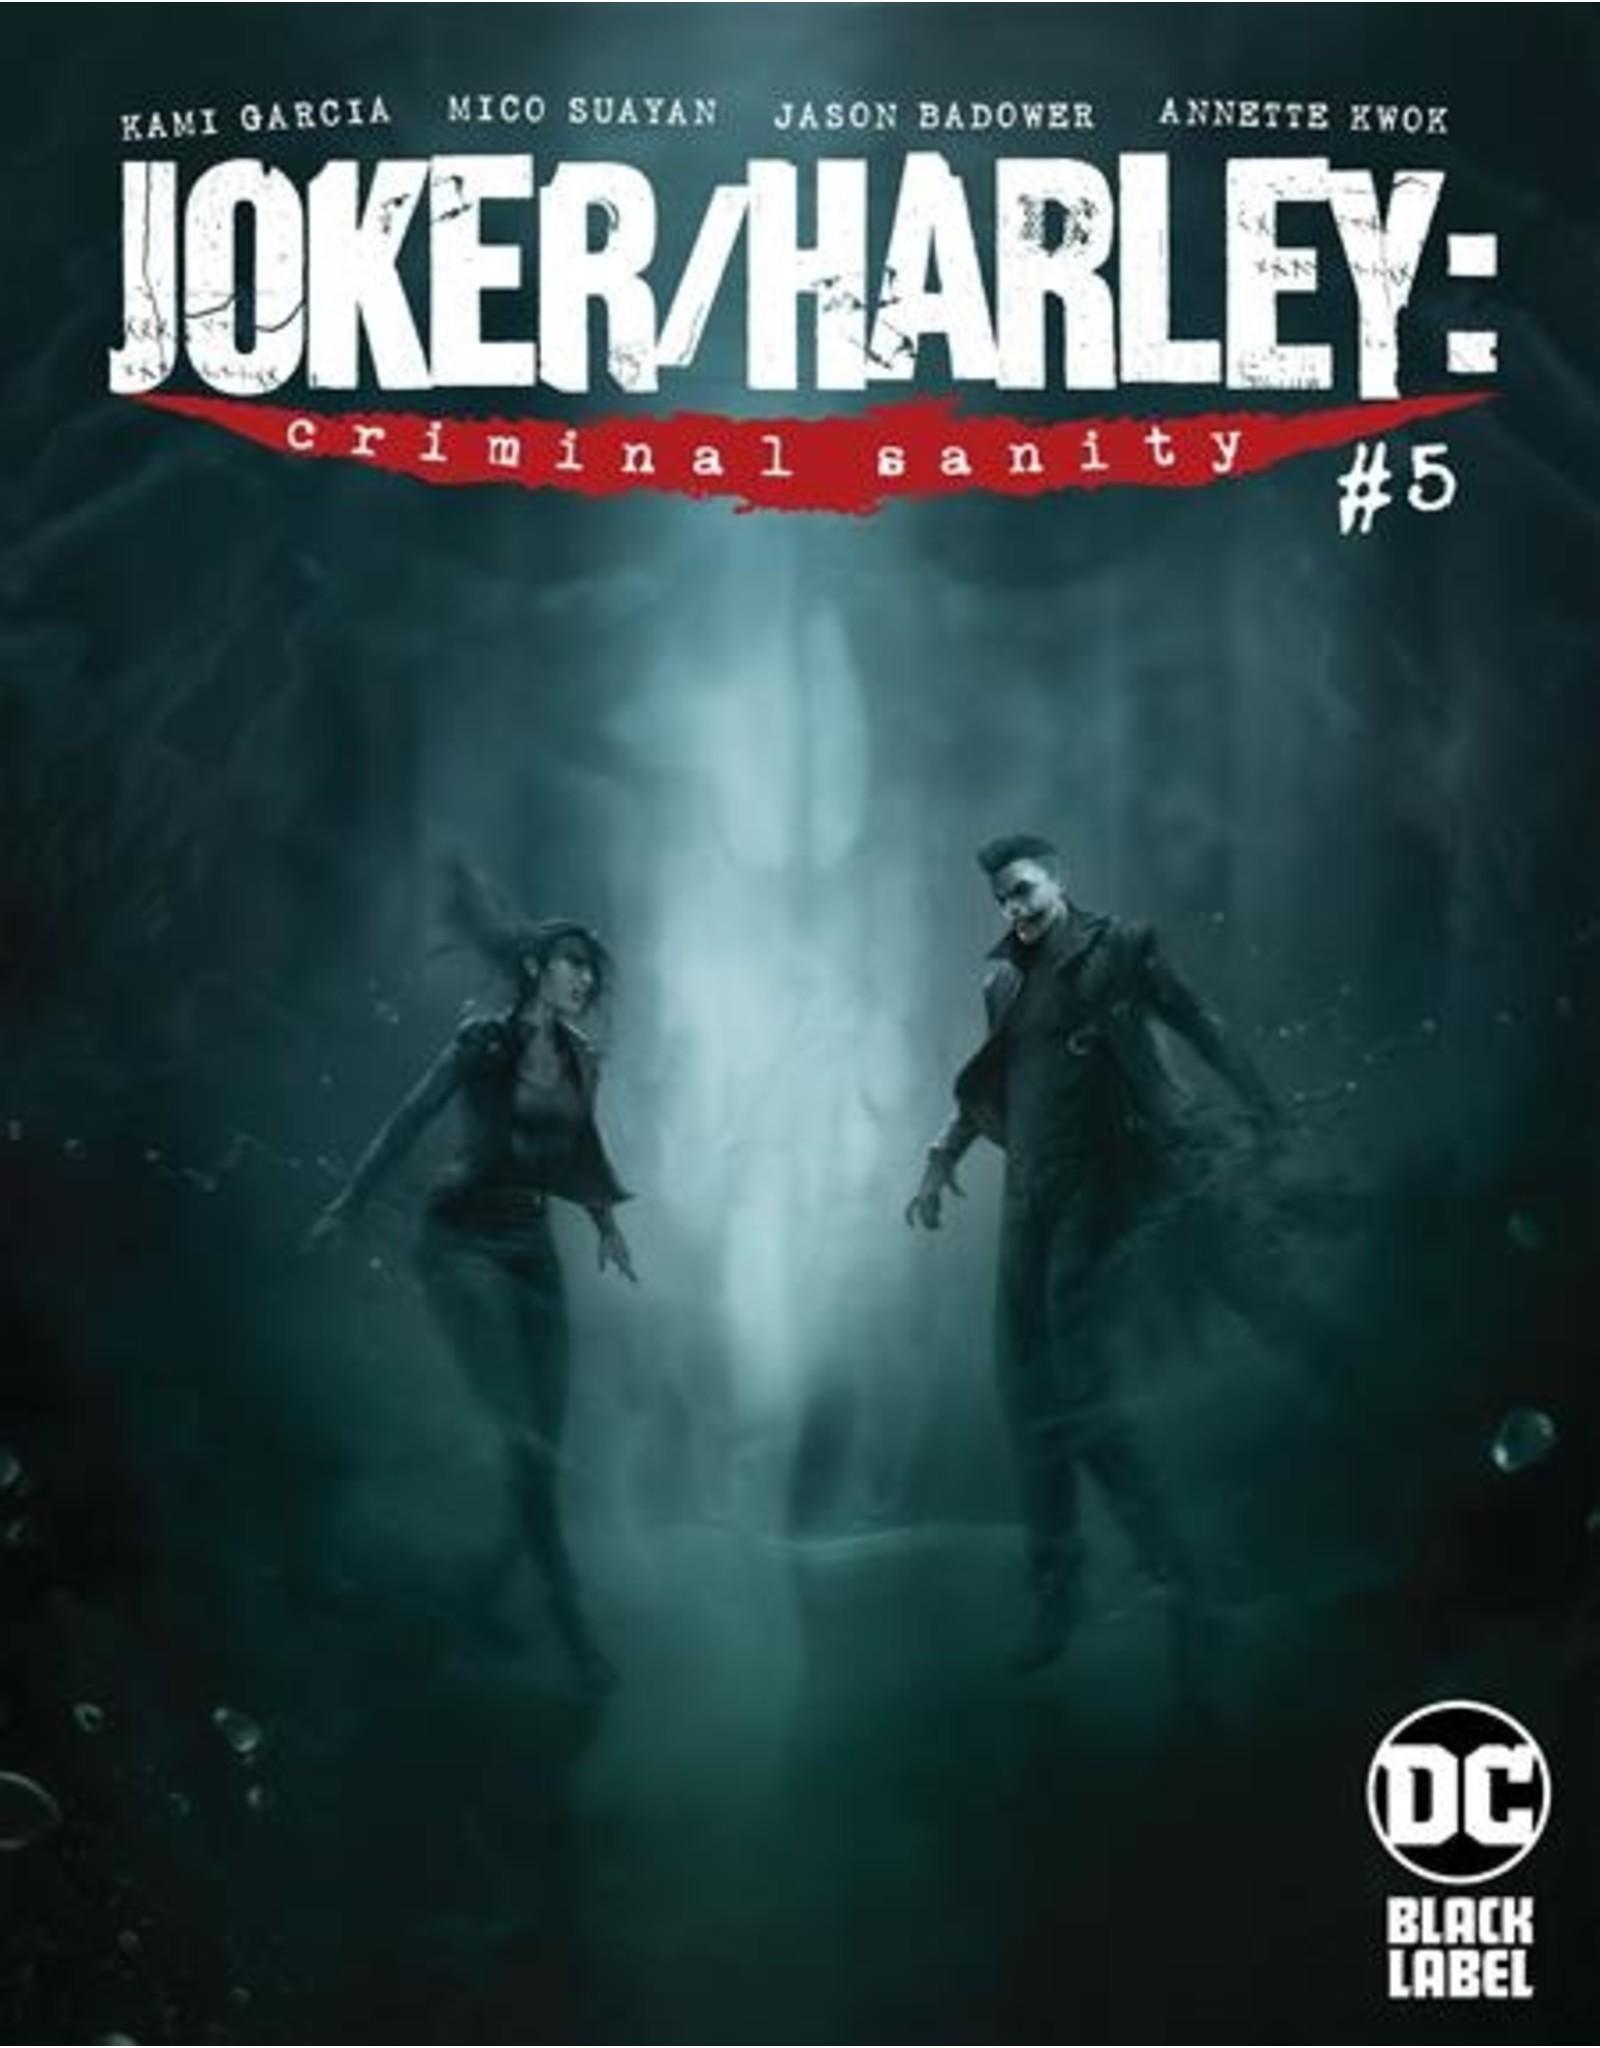 DC COMICS JOKER HARLEY CRIMINAL SANITY #5 (OF 9) CVR A FRANCESCO MATTINA